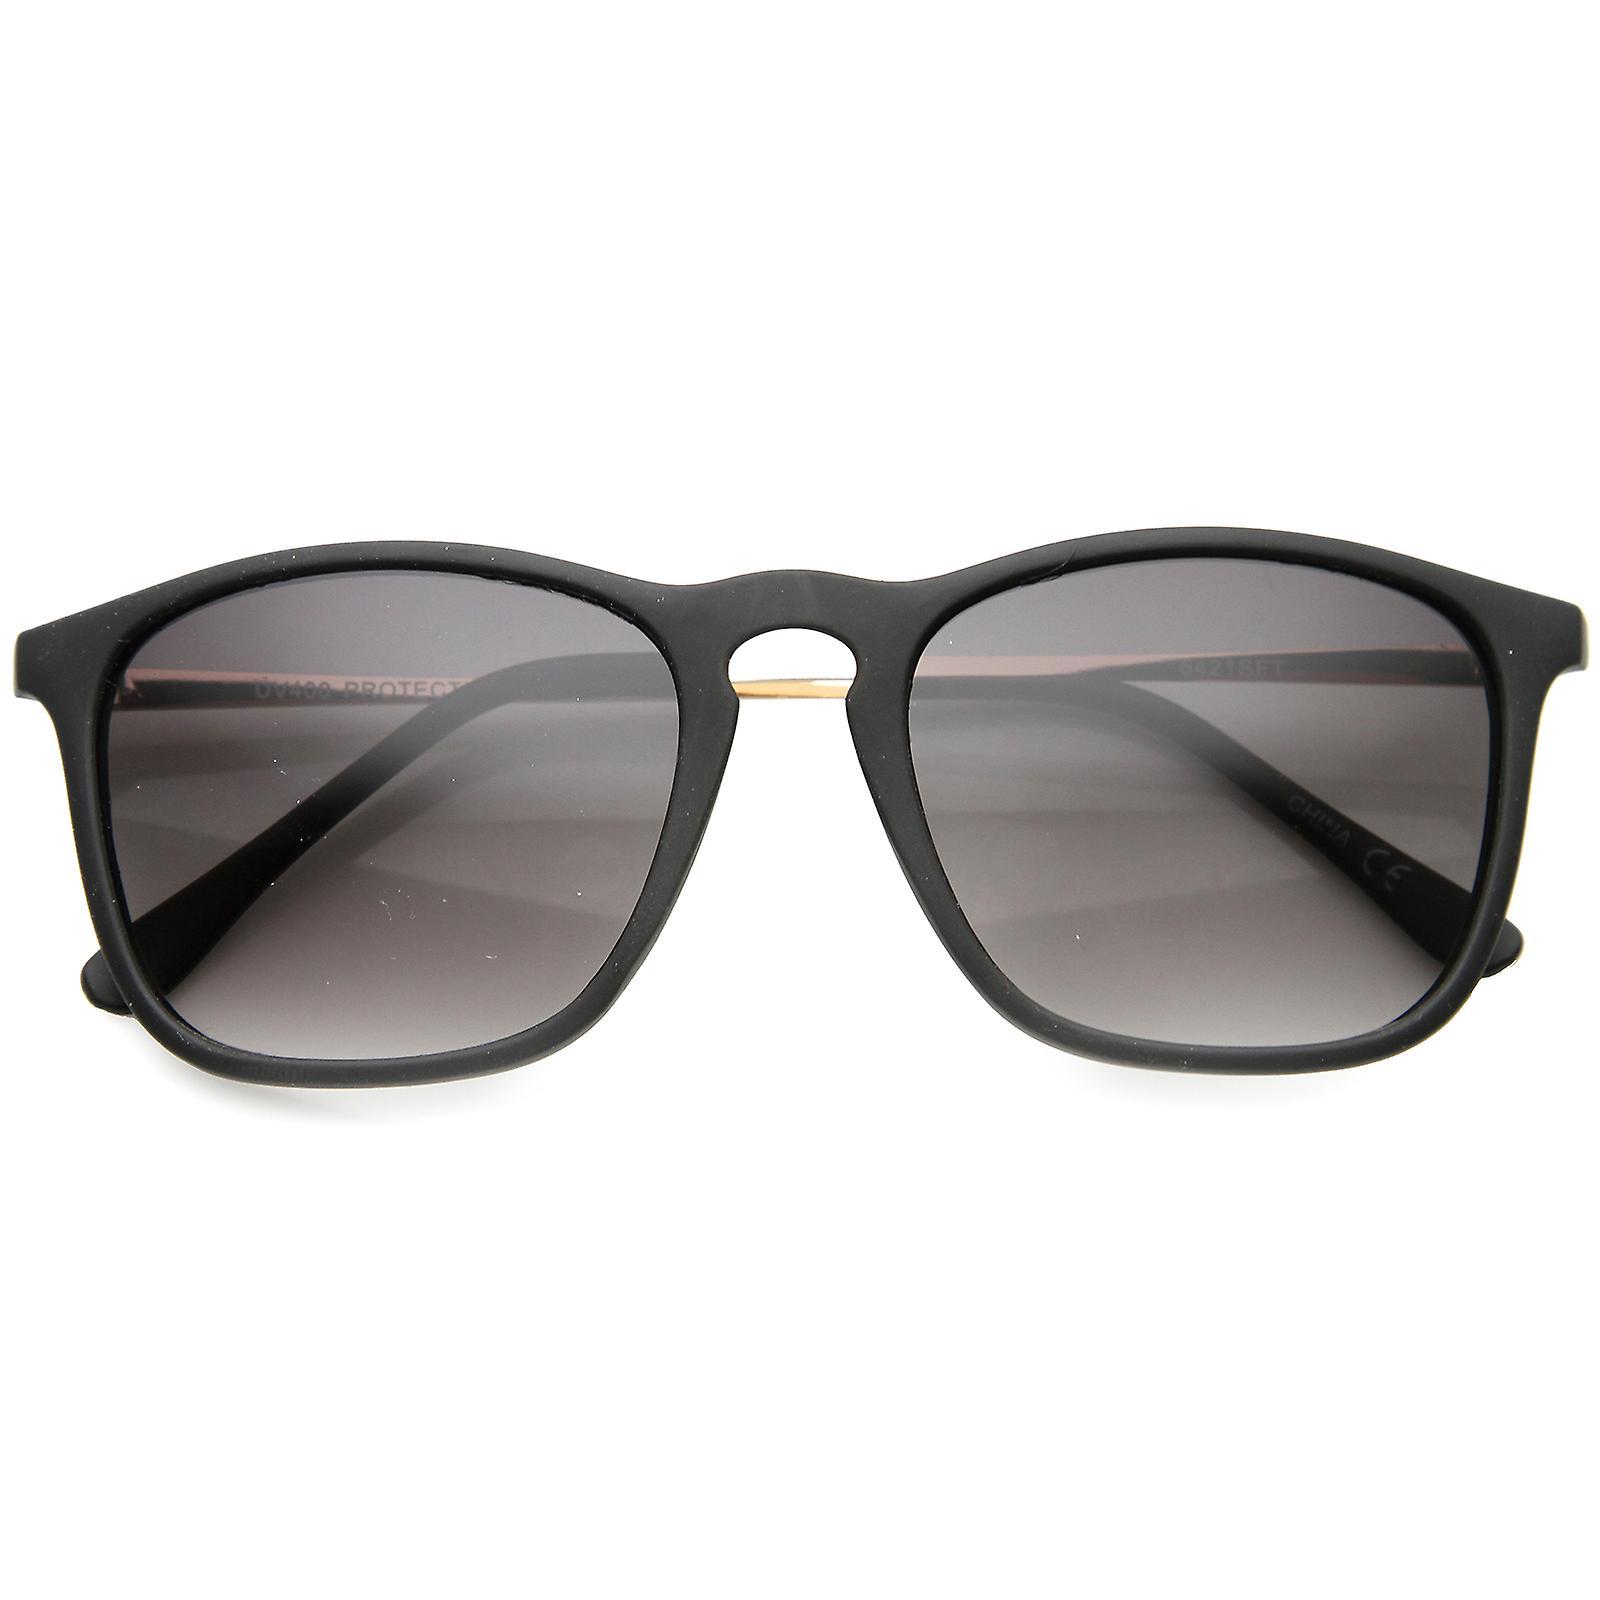 66c2528e7d Mens Rectangular Sunglasses With UV400 Protected Gradient Lens